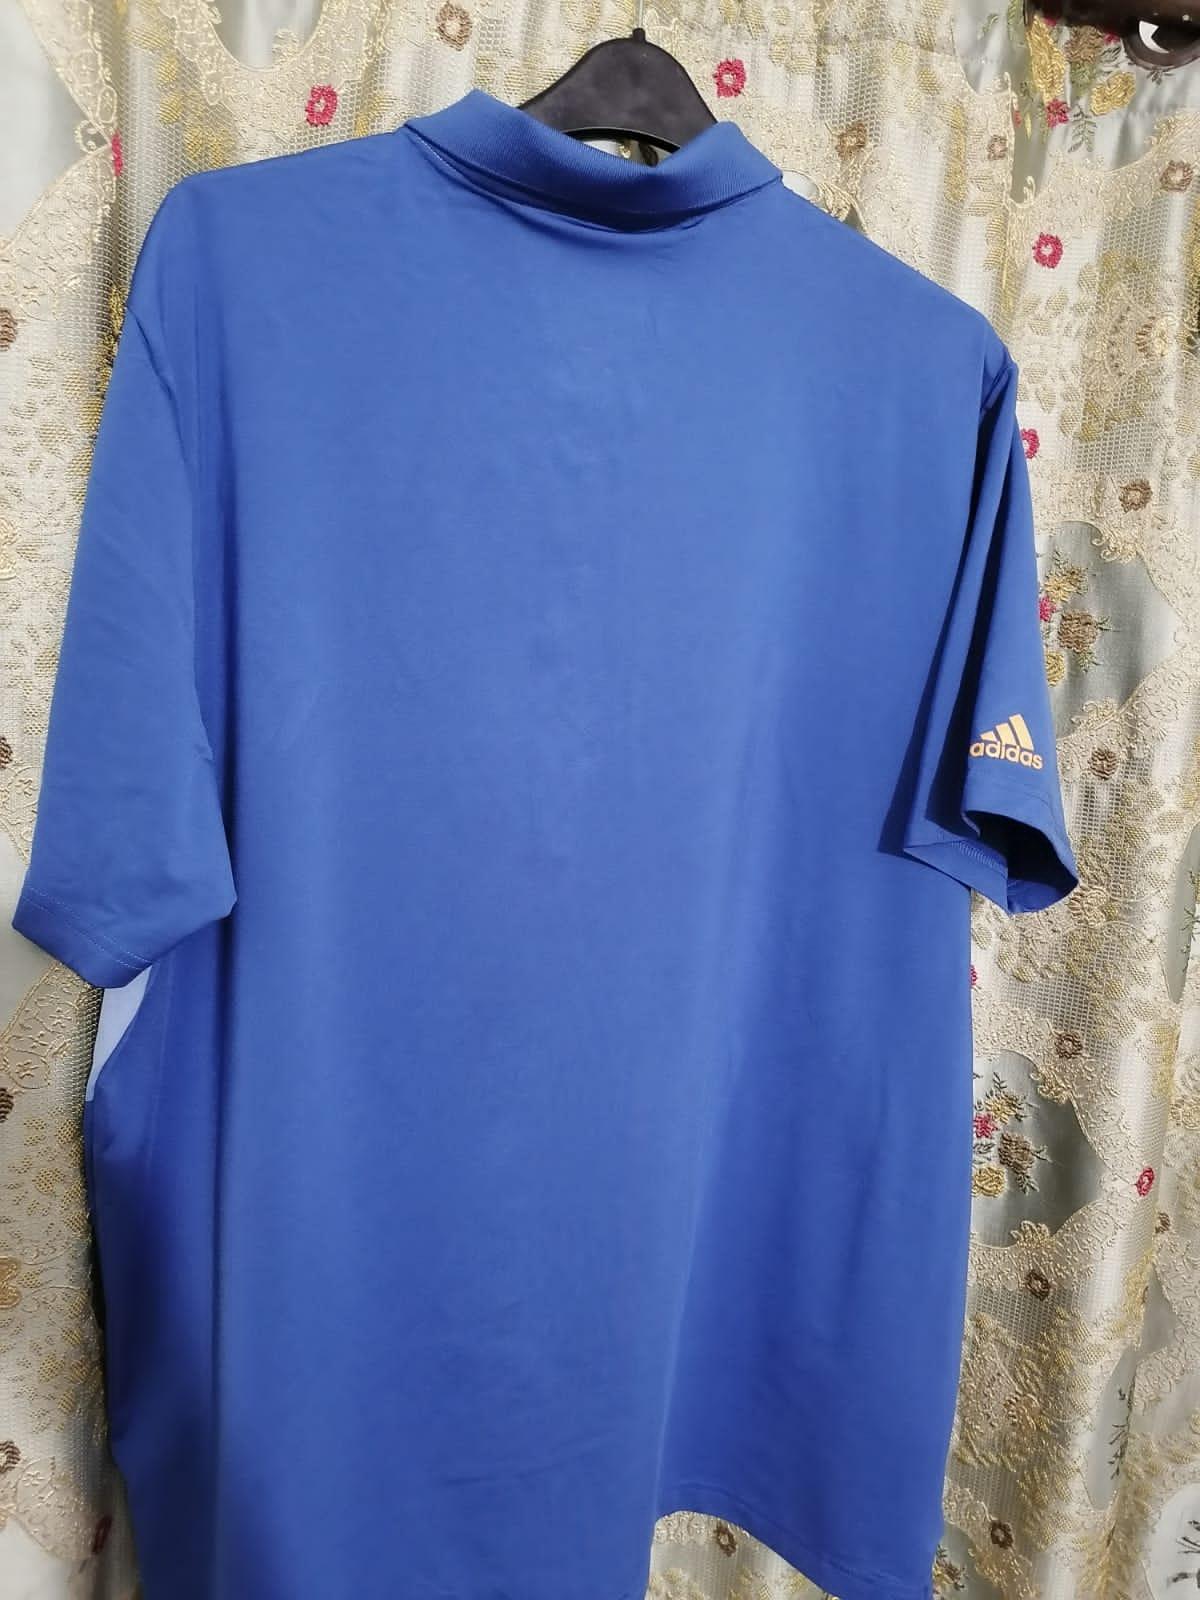 Adidas Men's Golf Shirt – Blue/White